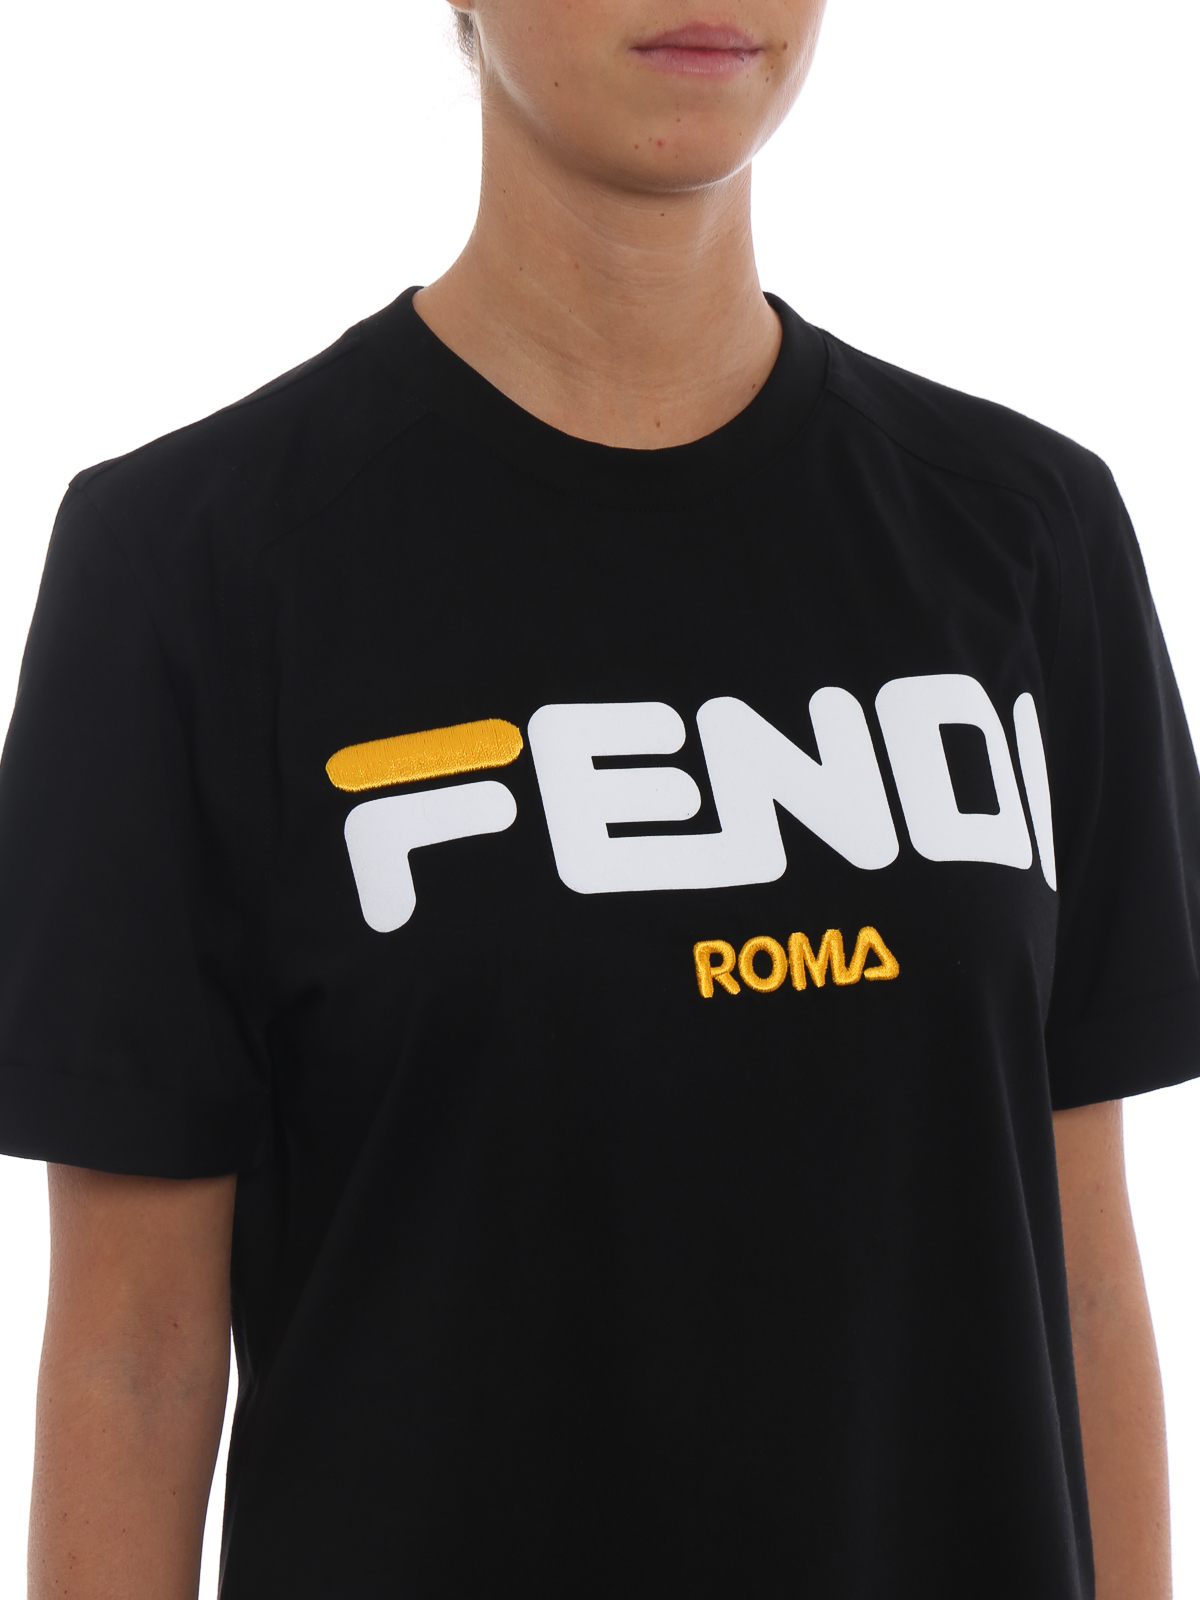 9bd9cdd36 Fendi - Fila and Fendi collaboration cotton T-shirt - t-shirts ...